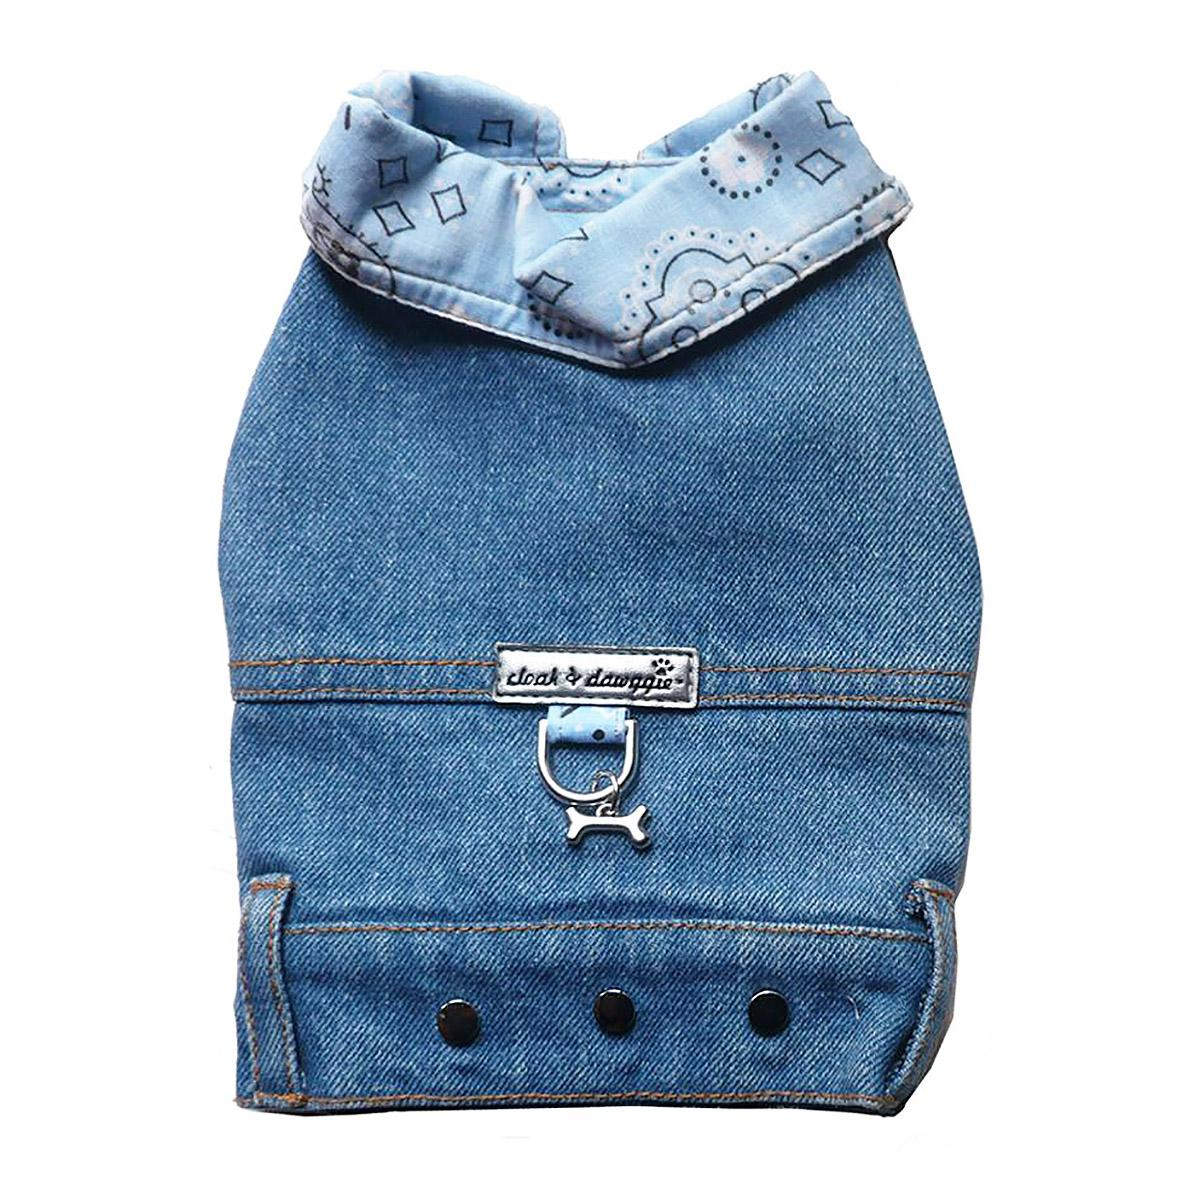 Denim Jean Jacket Dog Harness Vest with Blue Bandana Trim